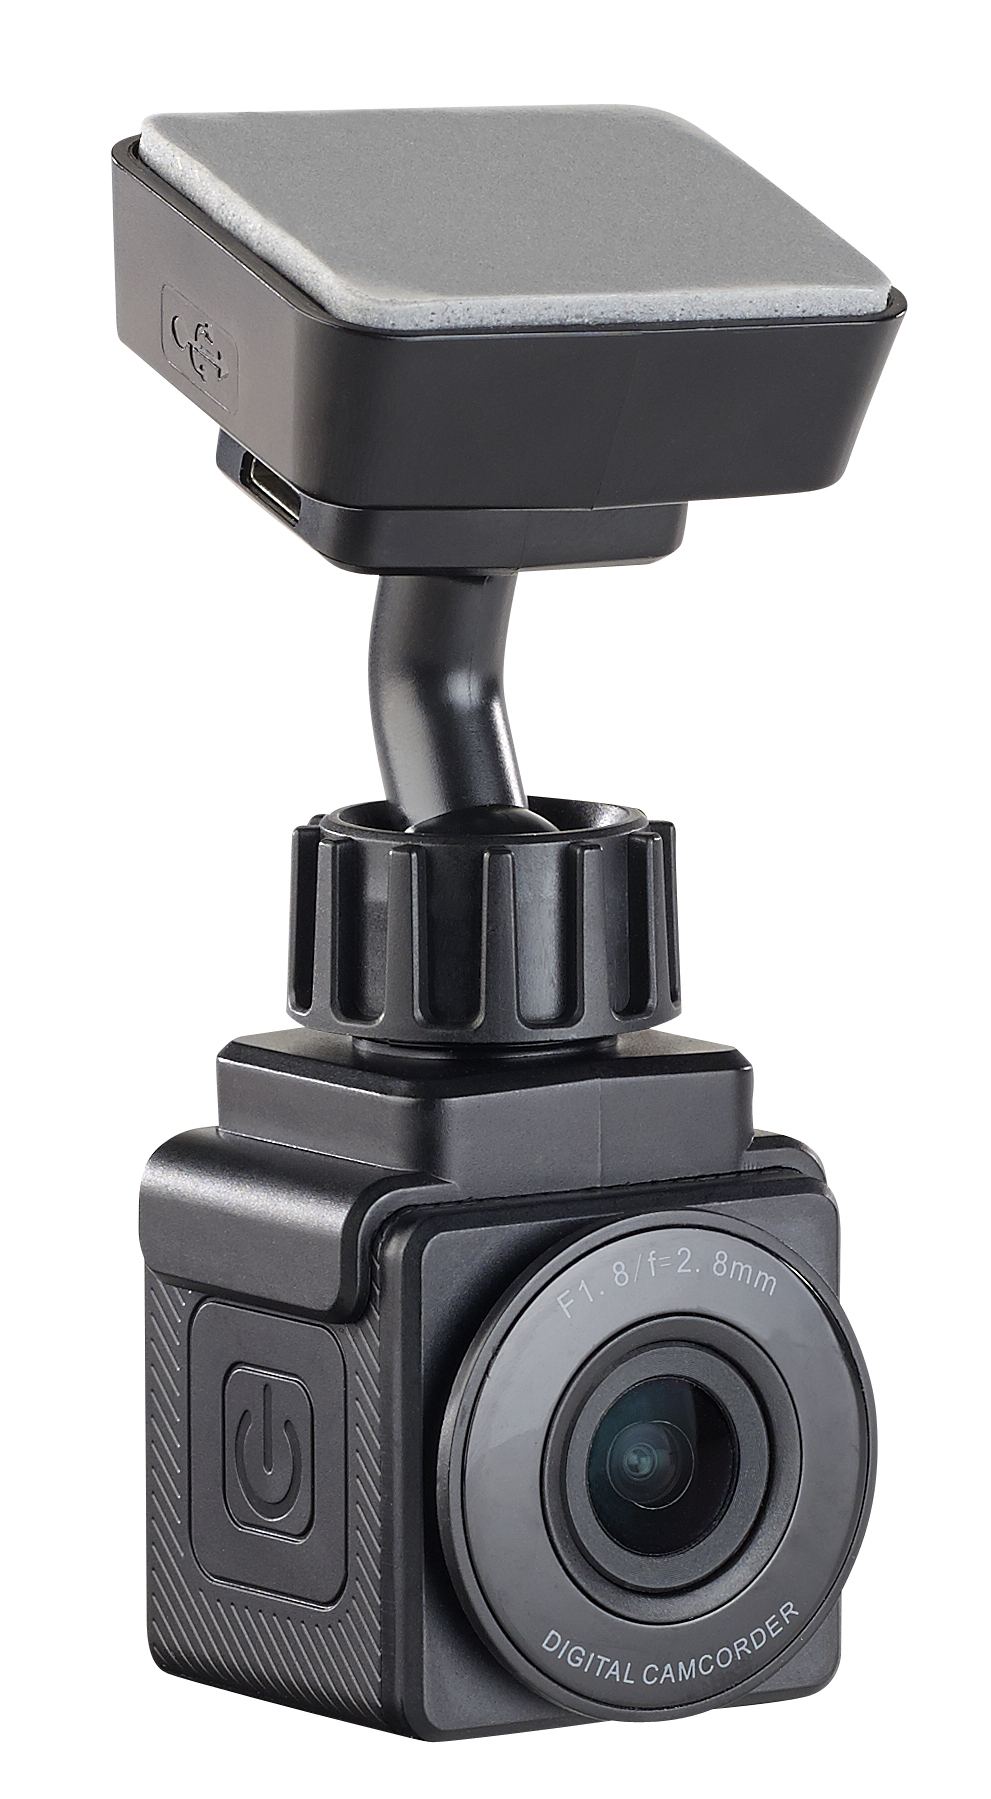 navgear mini full hd dashcam mit wlan g sensor und gps. Black Bedroom Furniture Sets. Home Design Ideas